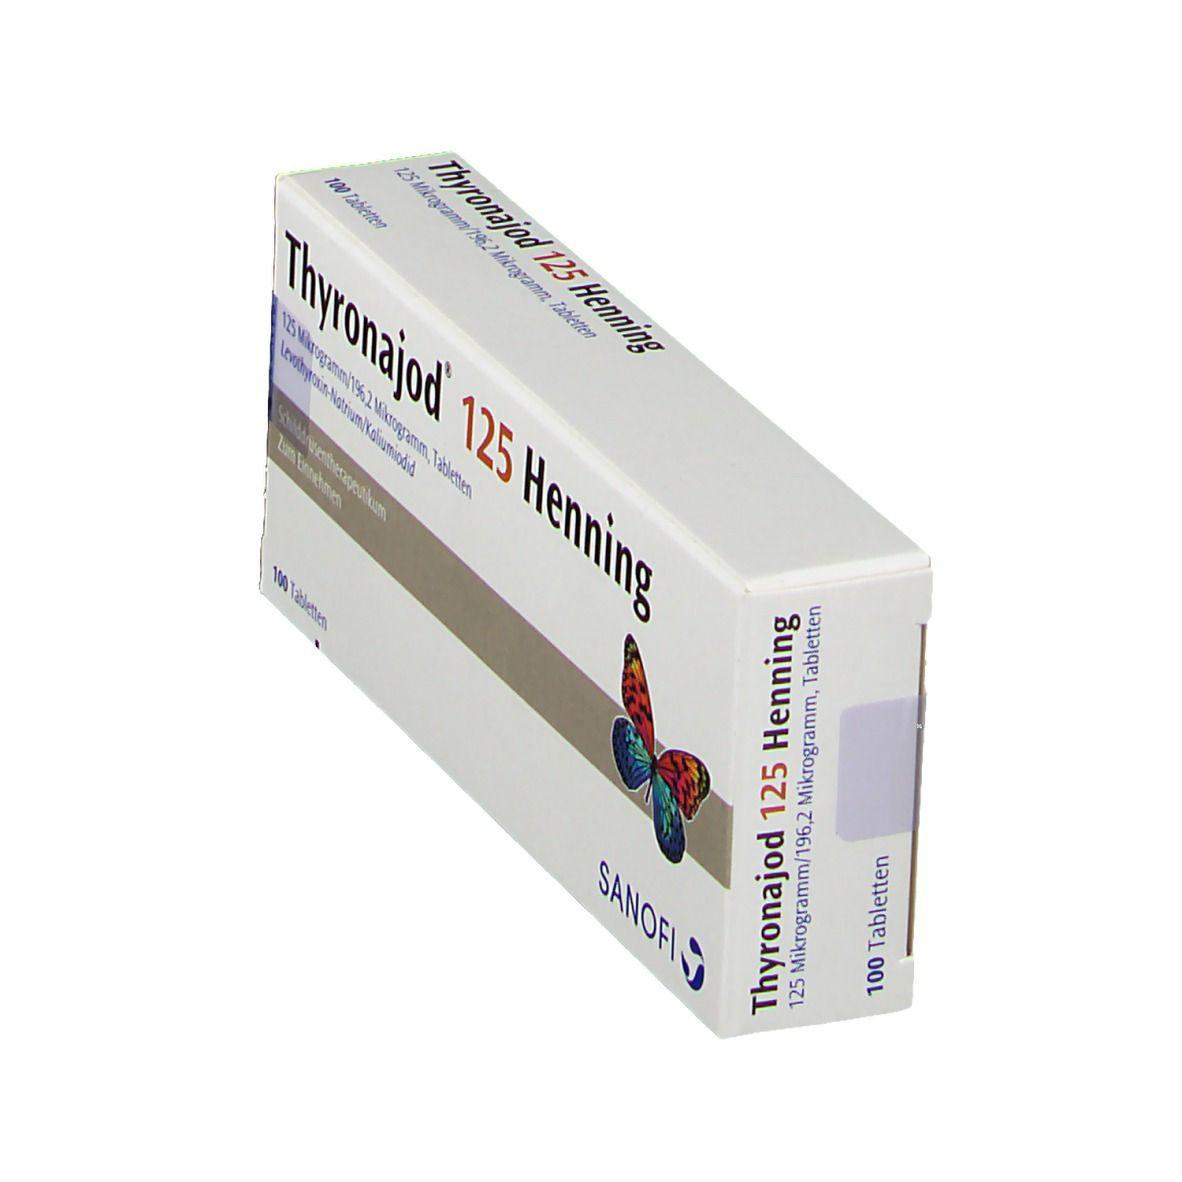 Thyronajod® 125 Henning Tabletten